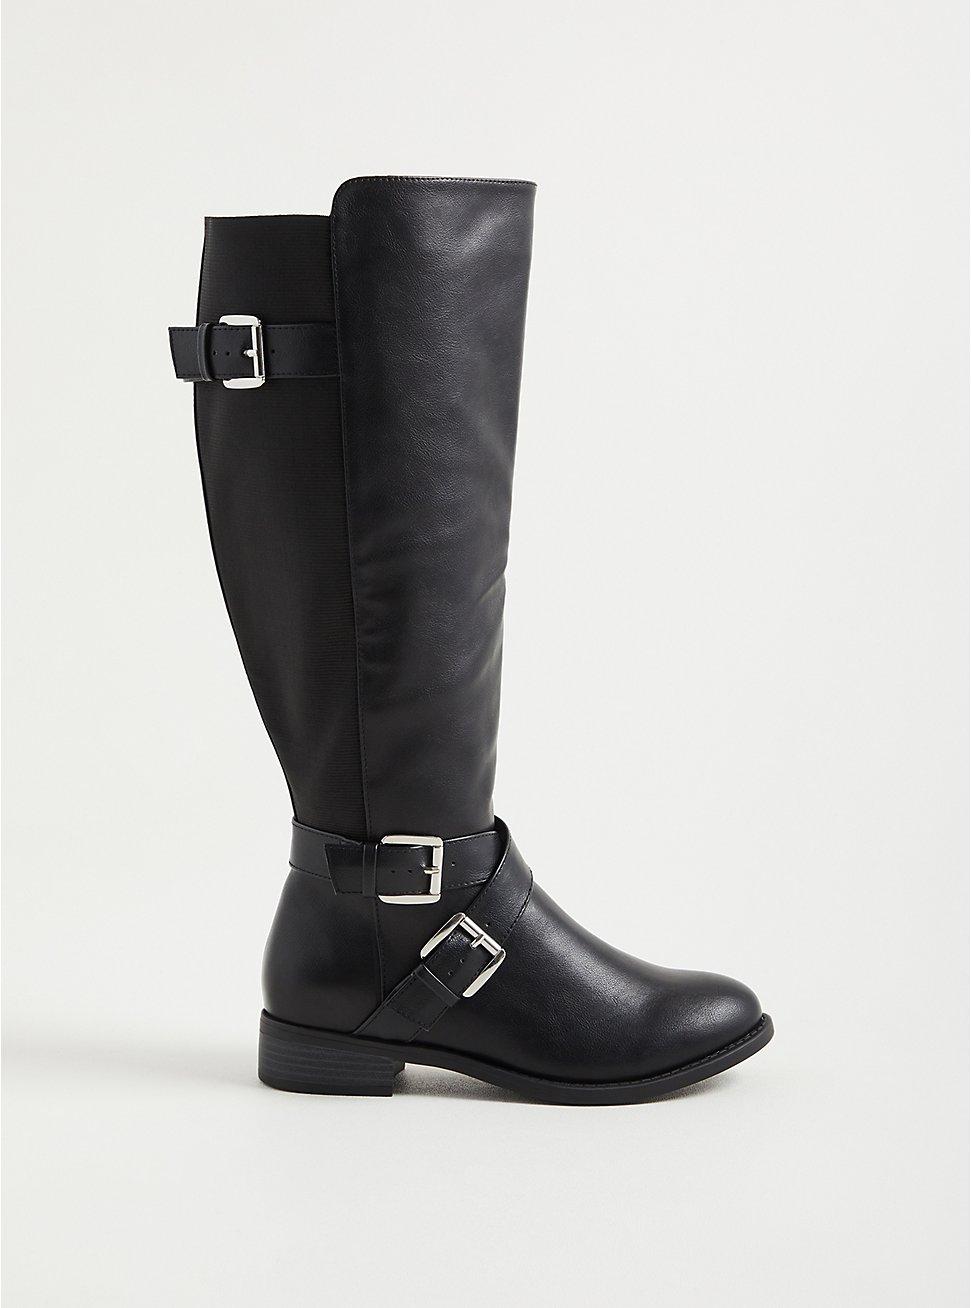 Brooke Side Buckle Knee Boot - Faux Leather Black (WW), BLACK, hi-res